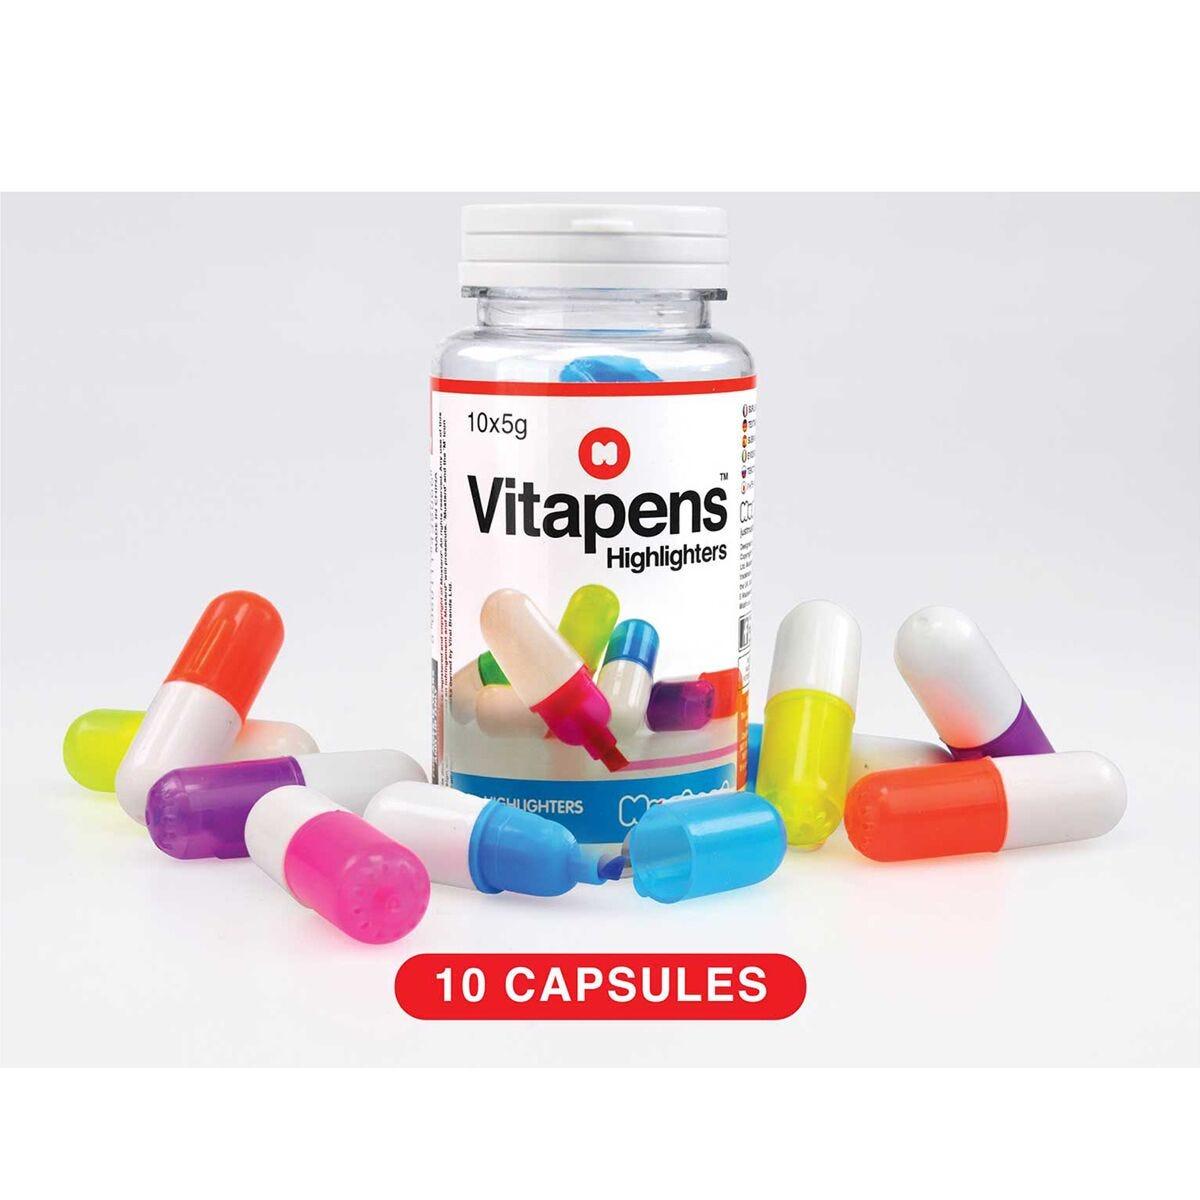 Vitapens Capsule Highlighters 10 in a Jar